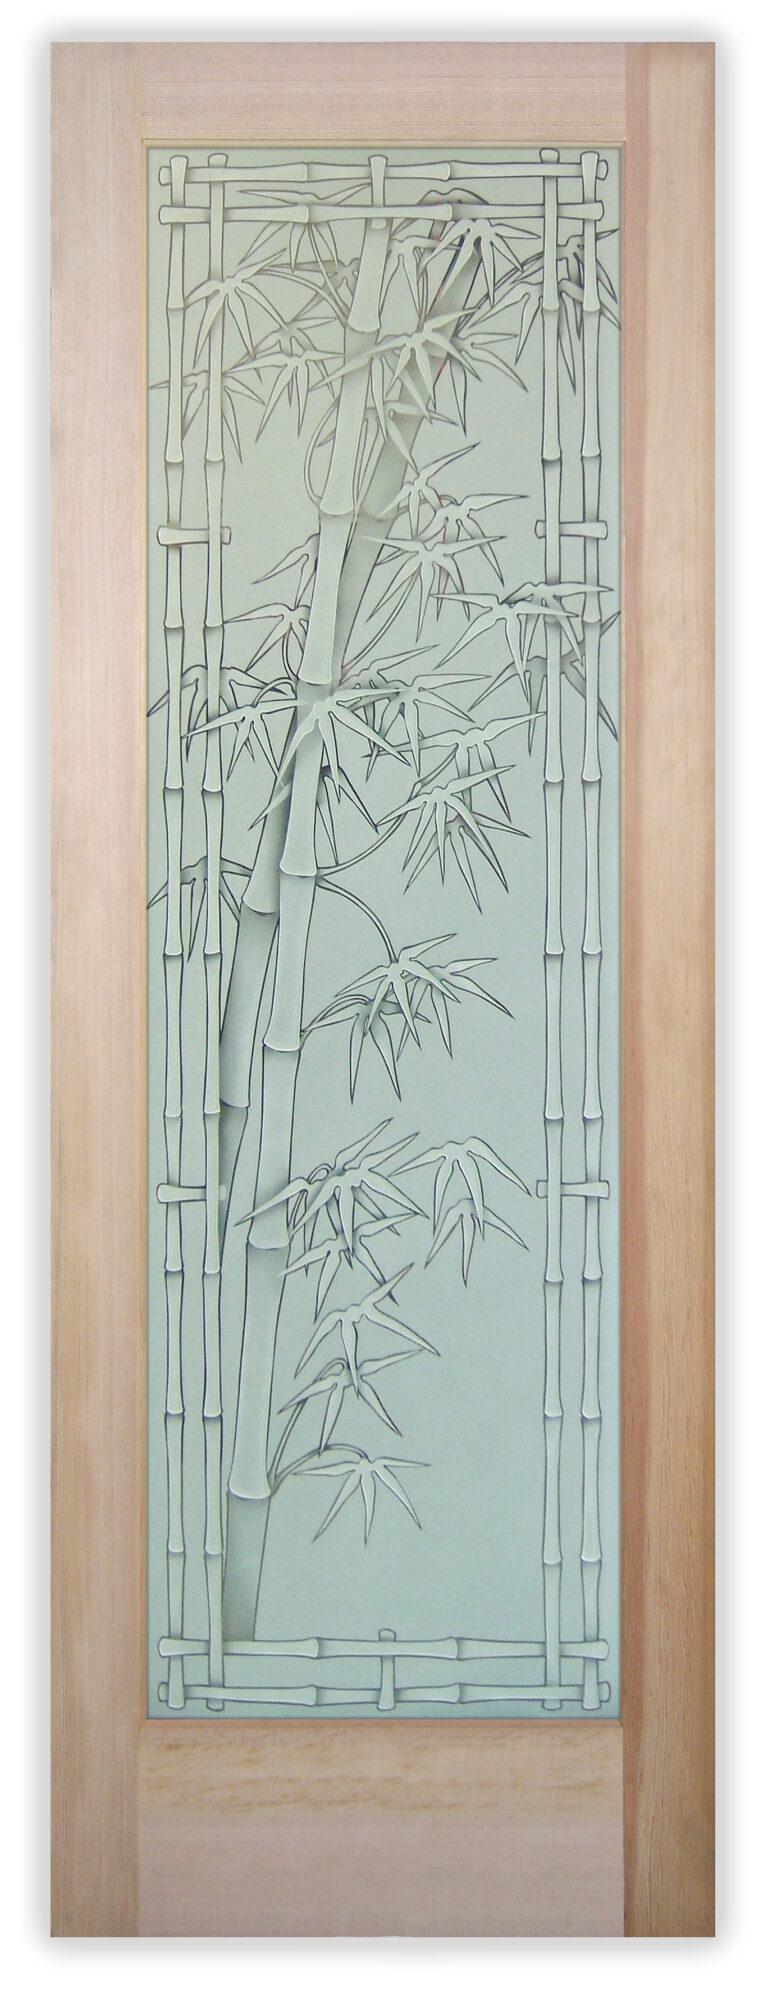 Bamboo Shoots Bordered